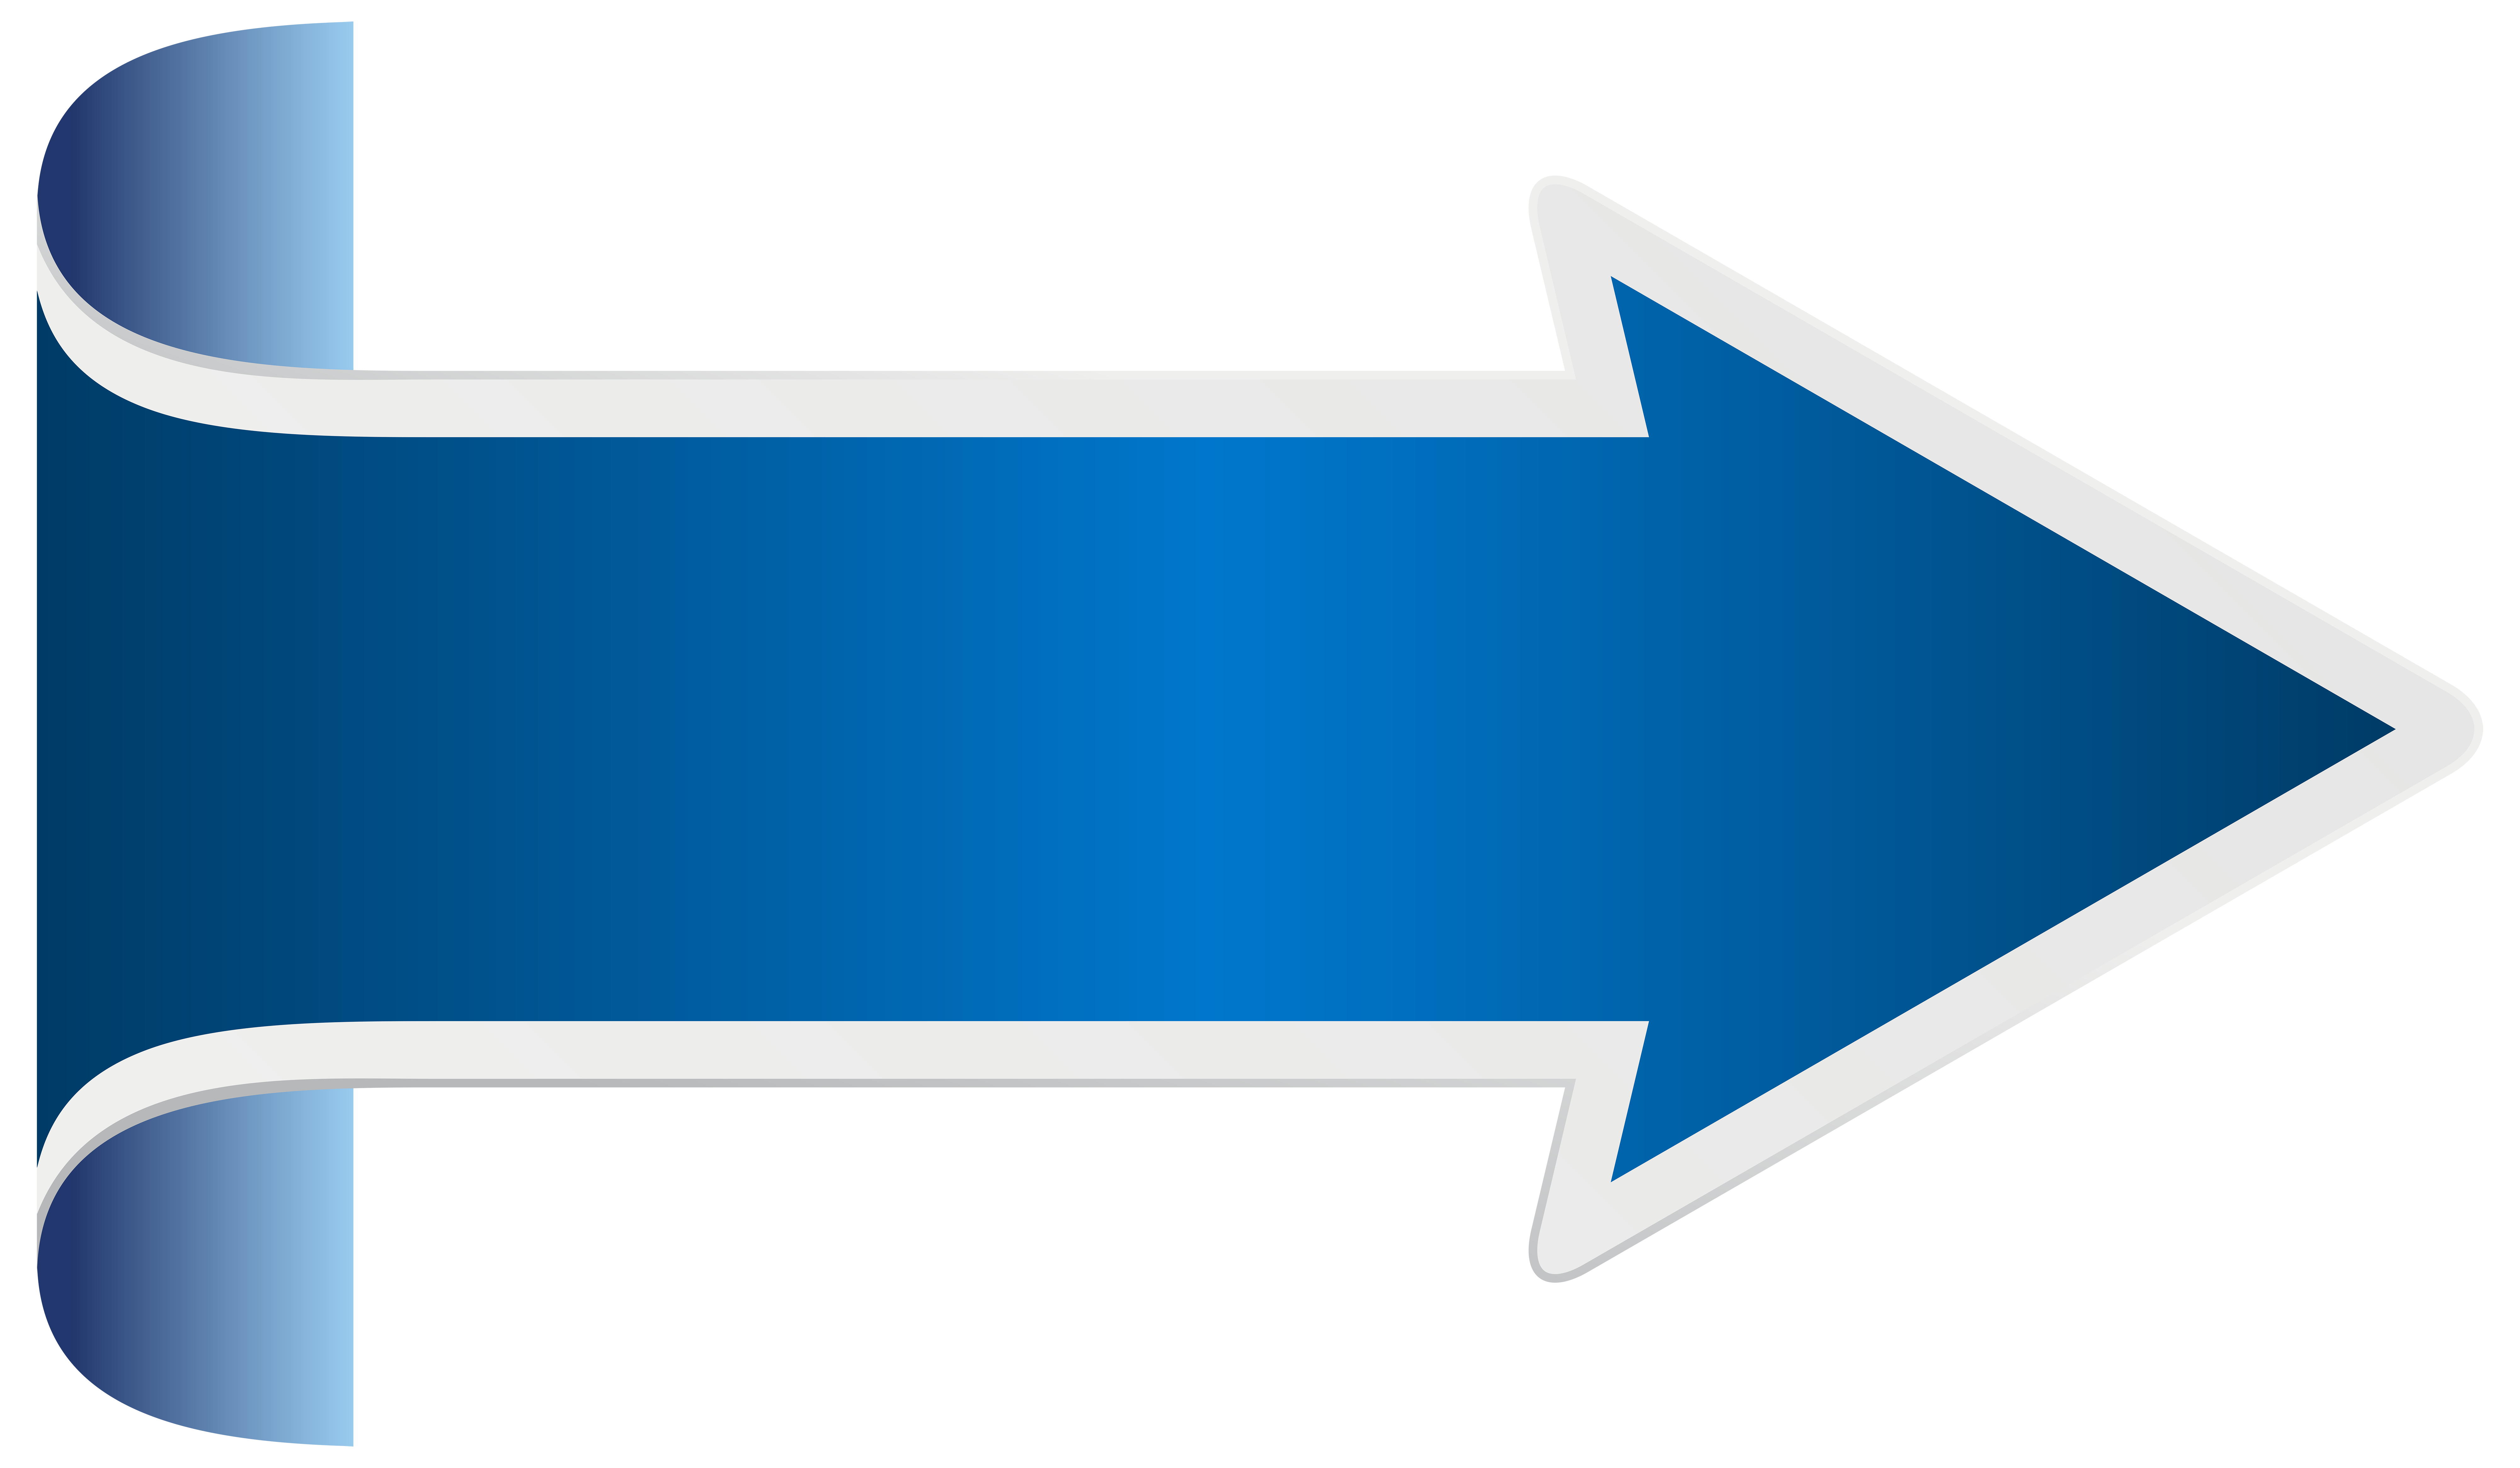 pin Arrow clipart blue arrow #2 - Arrow HD PNG - Free Arrow PNG HD